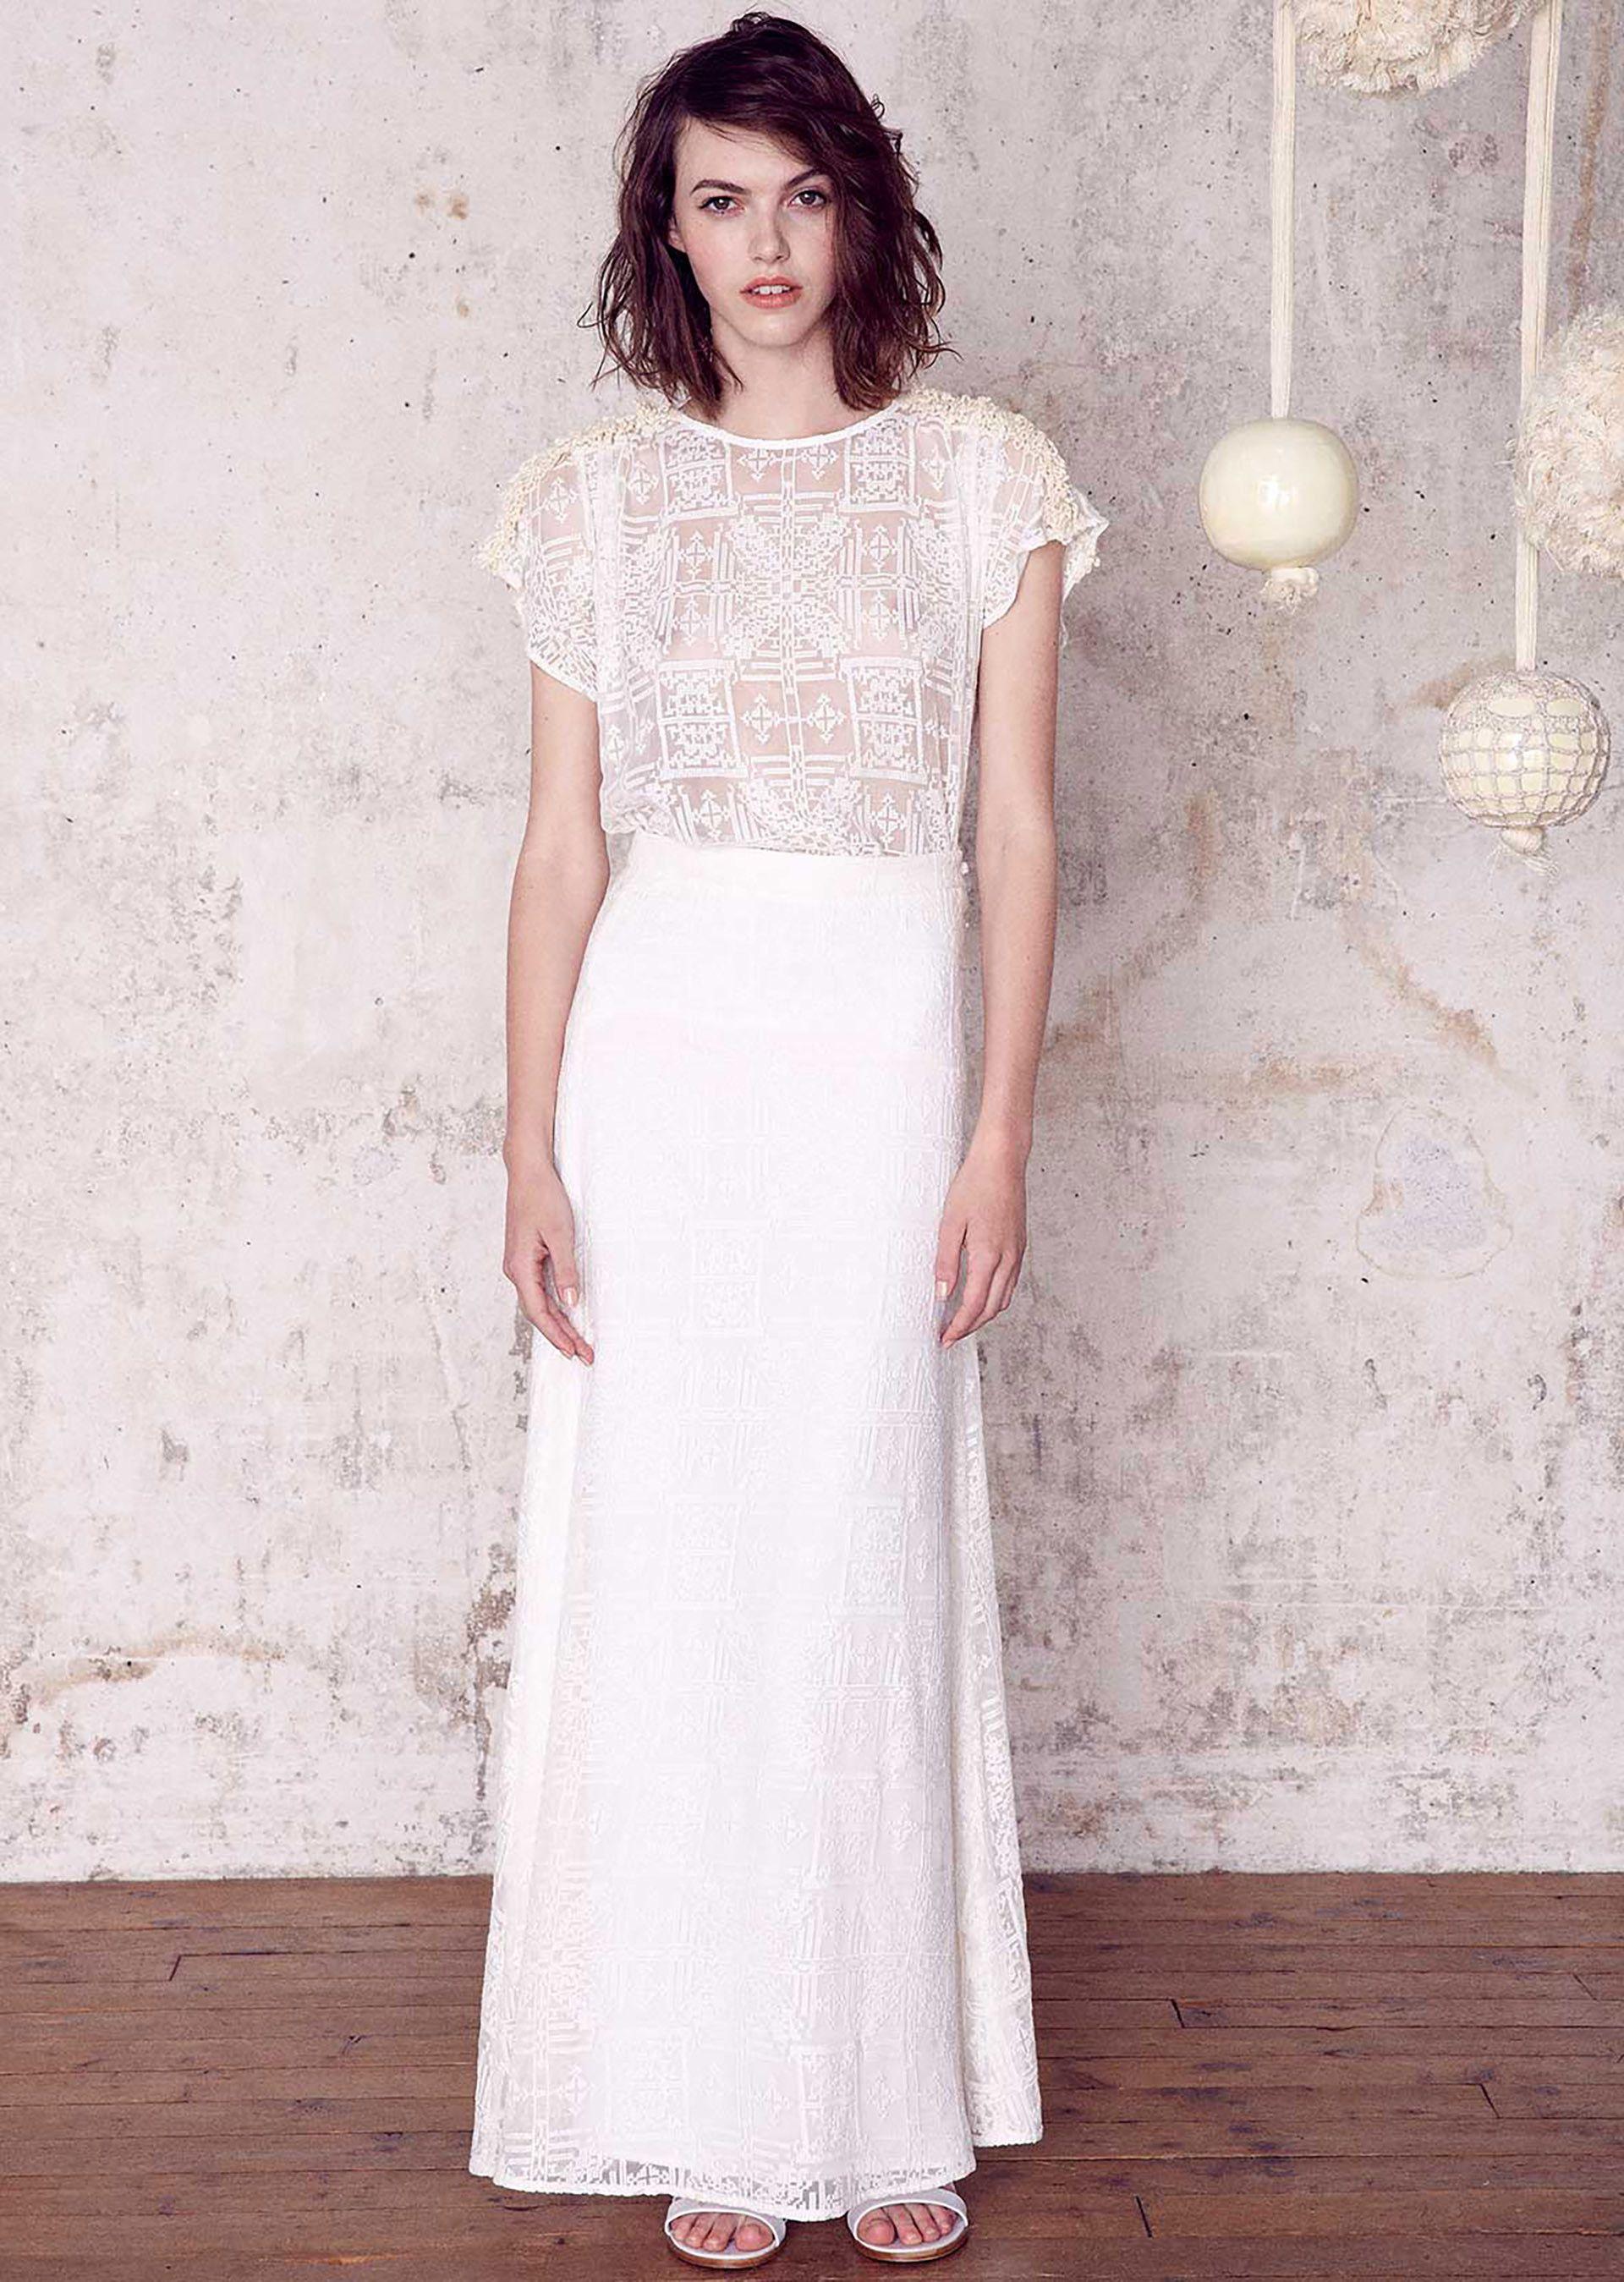 18-sessun-oui  Wedding dresses, Dresses, Gown wedding dress